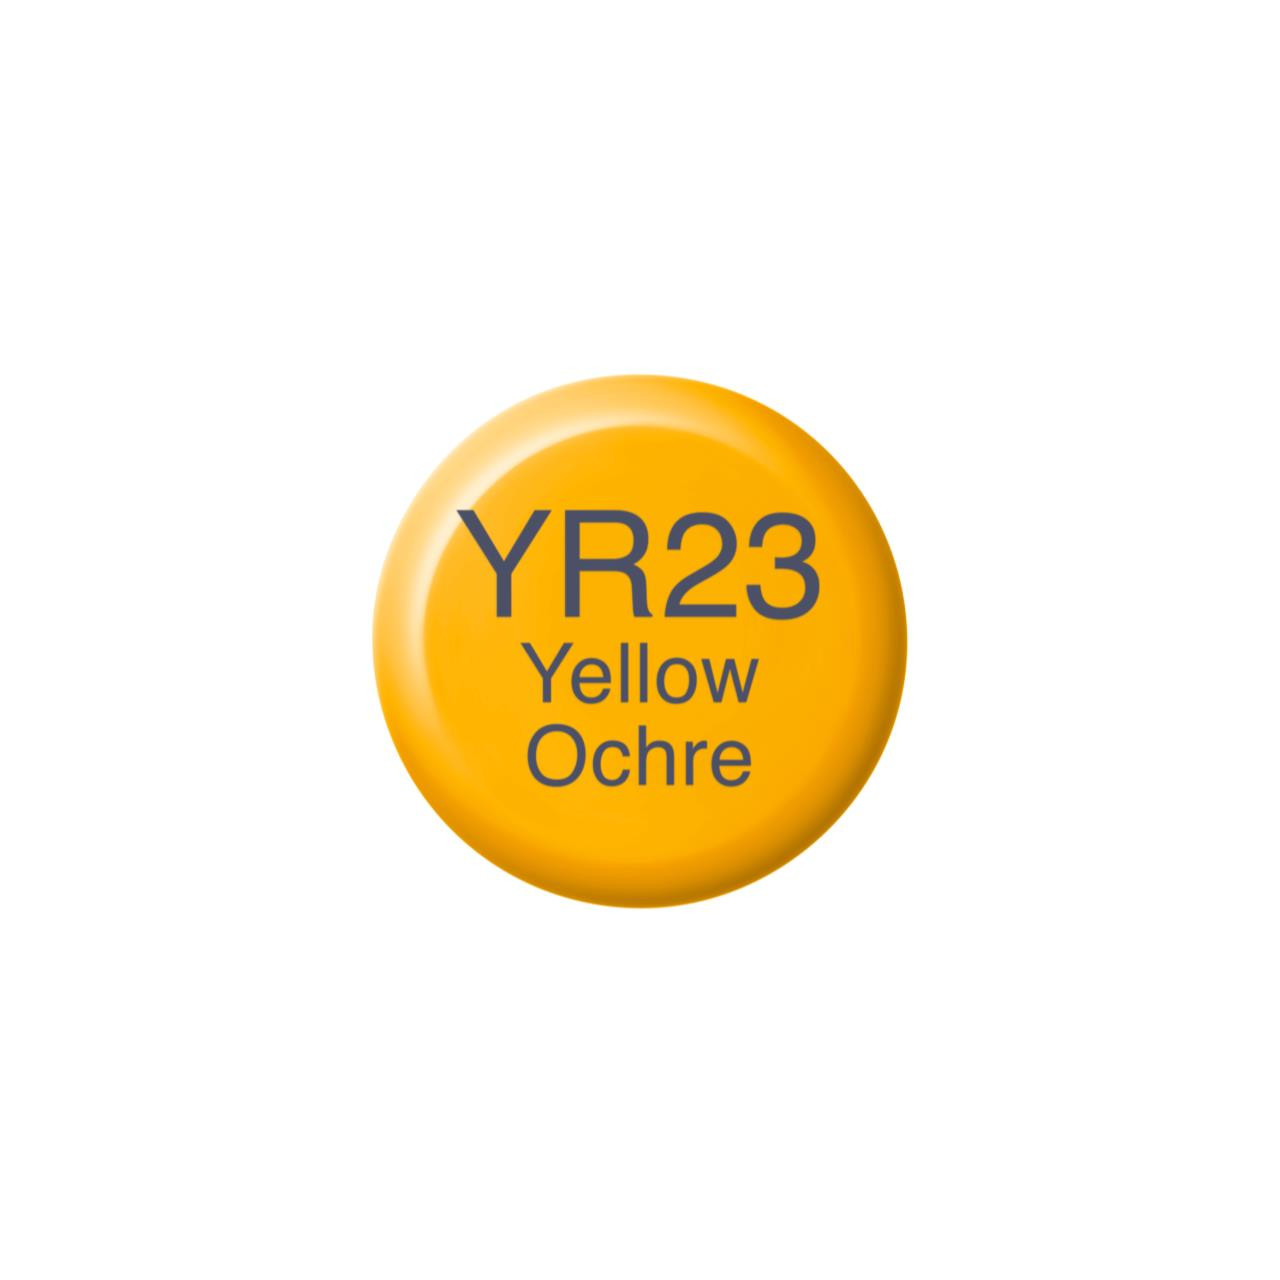 YR23 Yellow Ochre, Copic Ink - 4511338058725